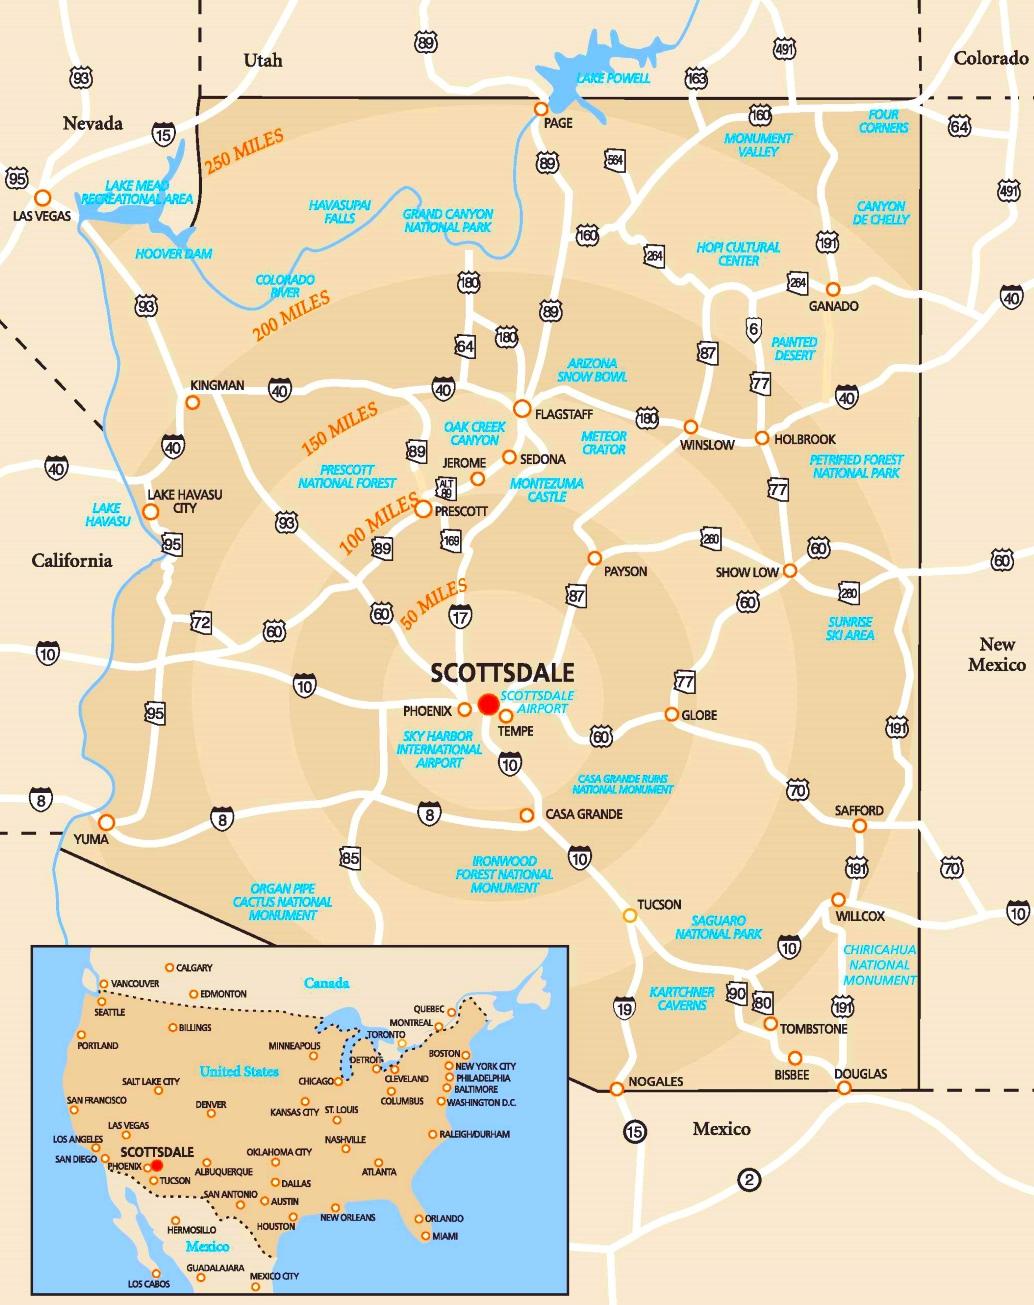 Scottsdale area road map